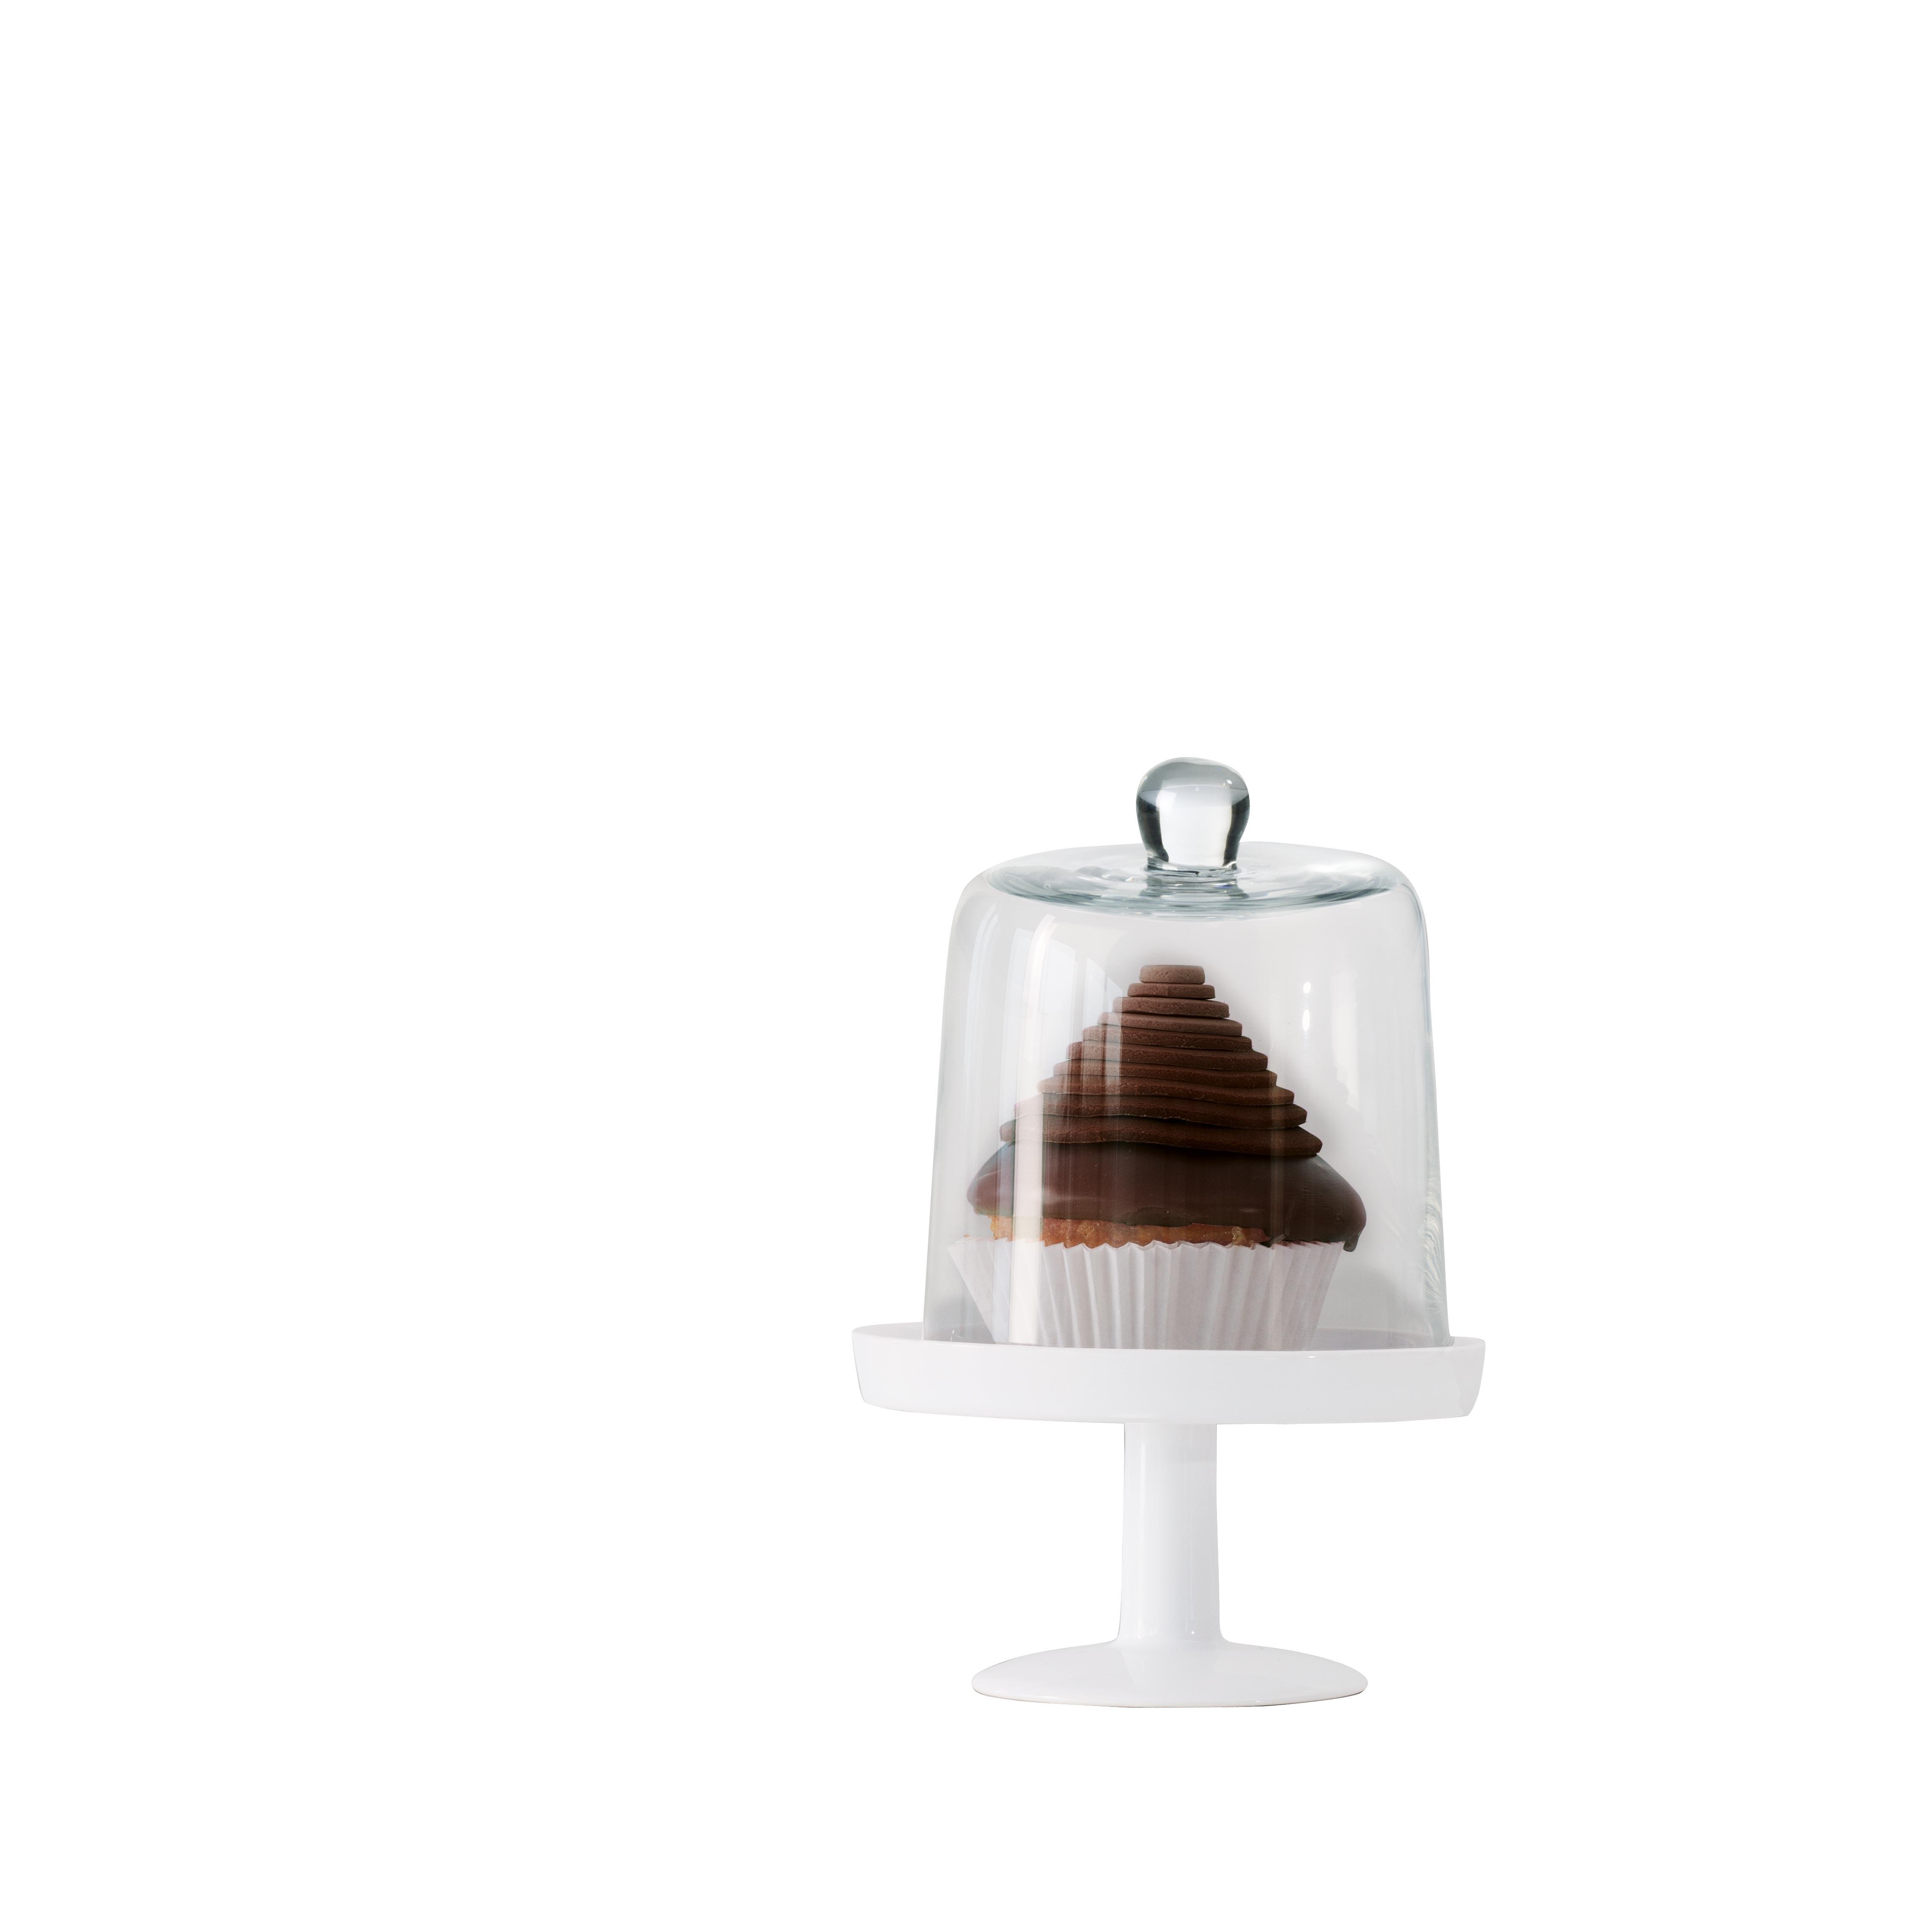 kleine tortenplatte home by asa the asa selection livingroom environments. Black Bedroom Furniture Sets. Home Design Ideas